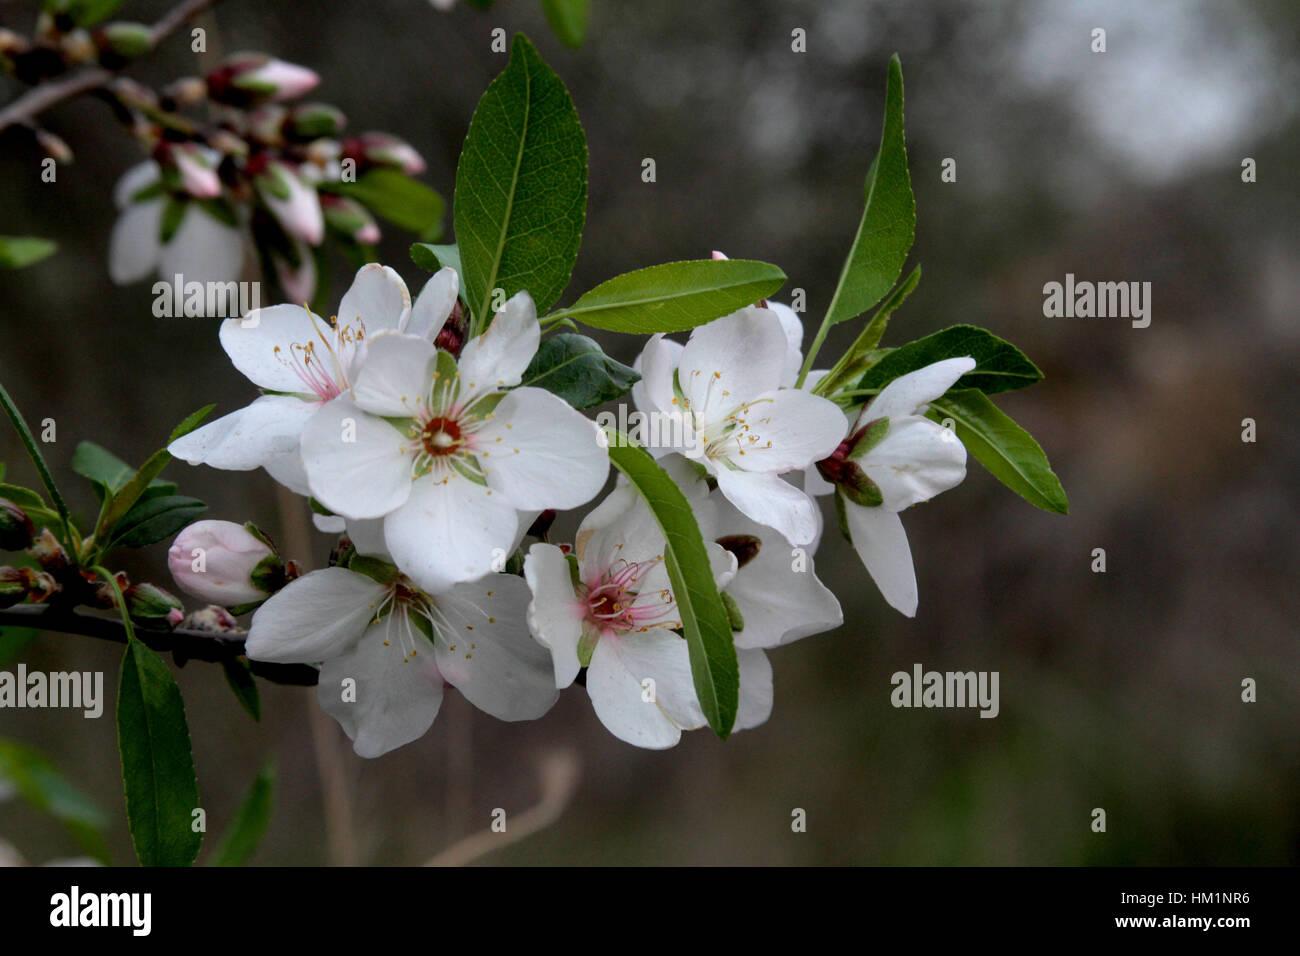 January 25, 2017 - Jenin, West Bank, Palestine - Almond blossoms bloom on a tree near the West Bank city of Jenin, - Stock Image